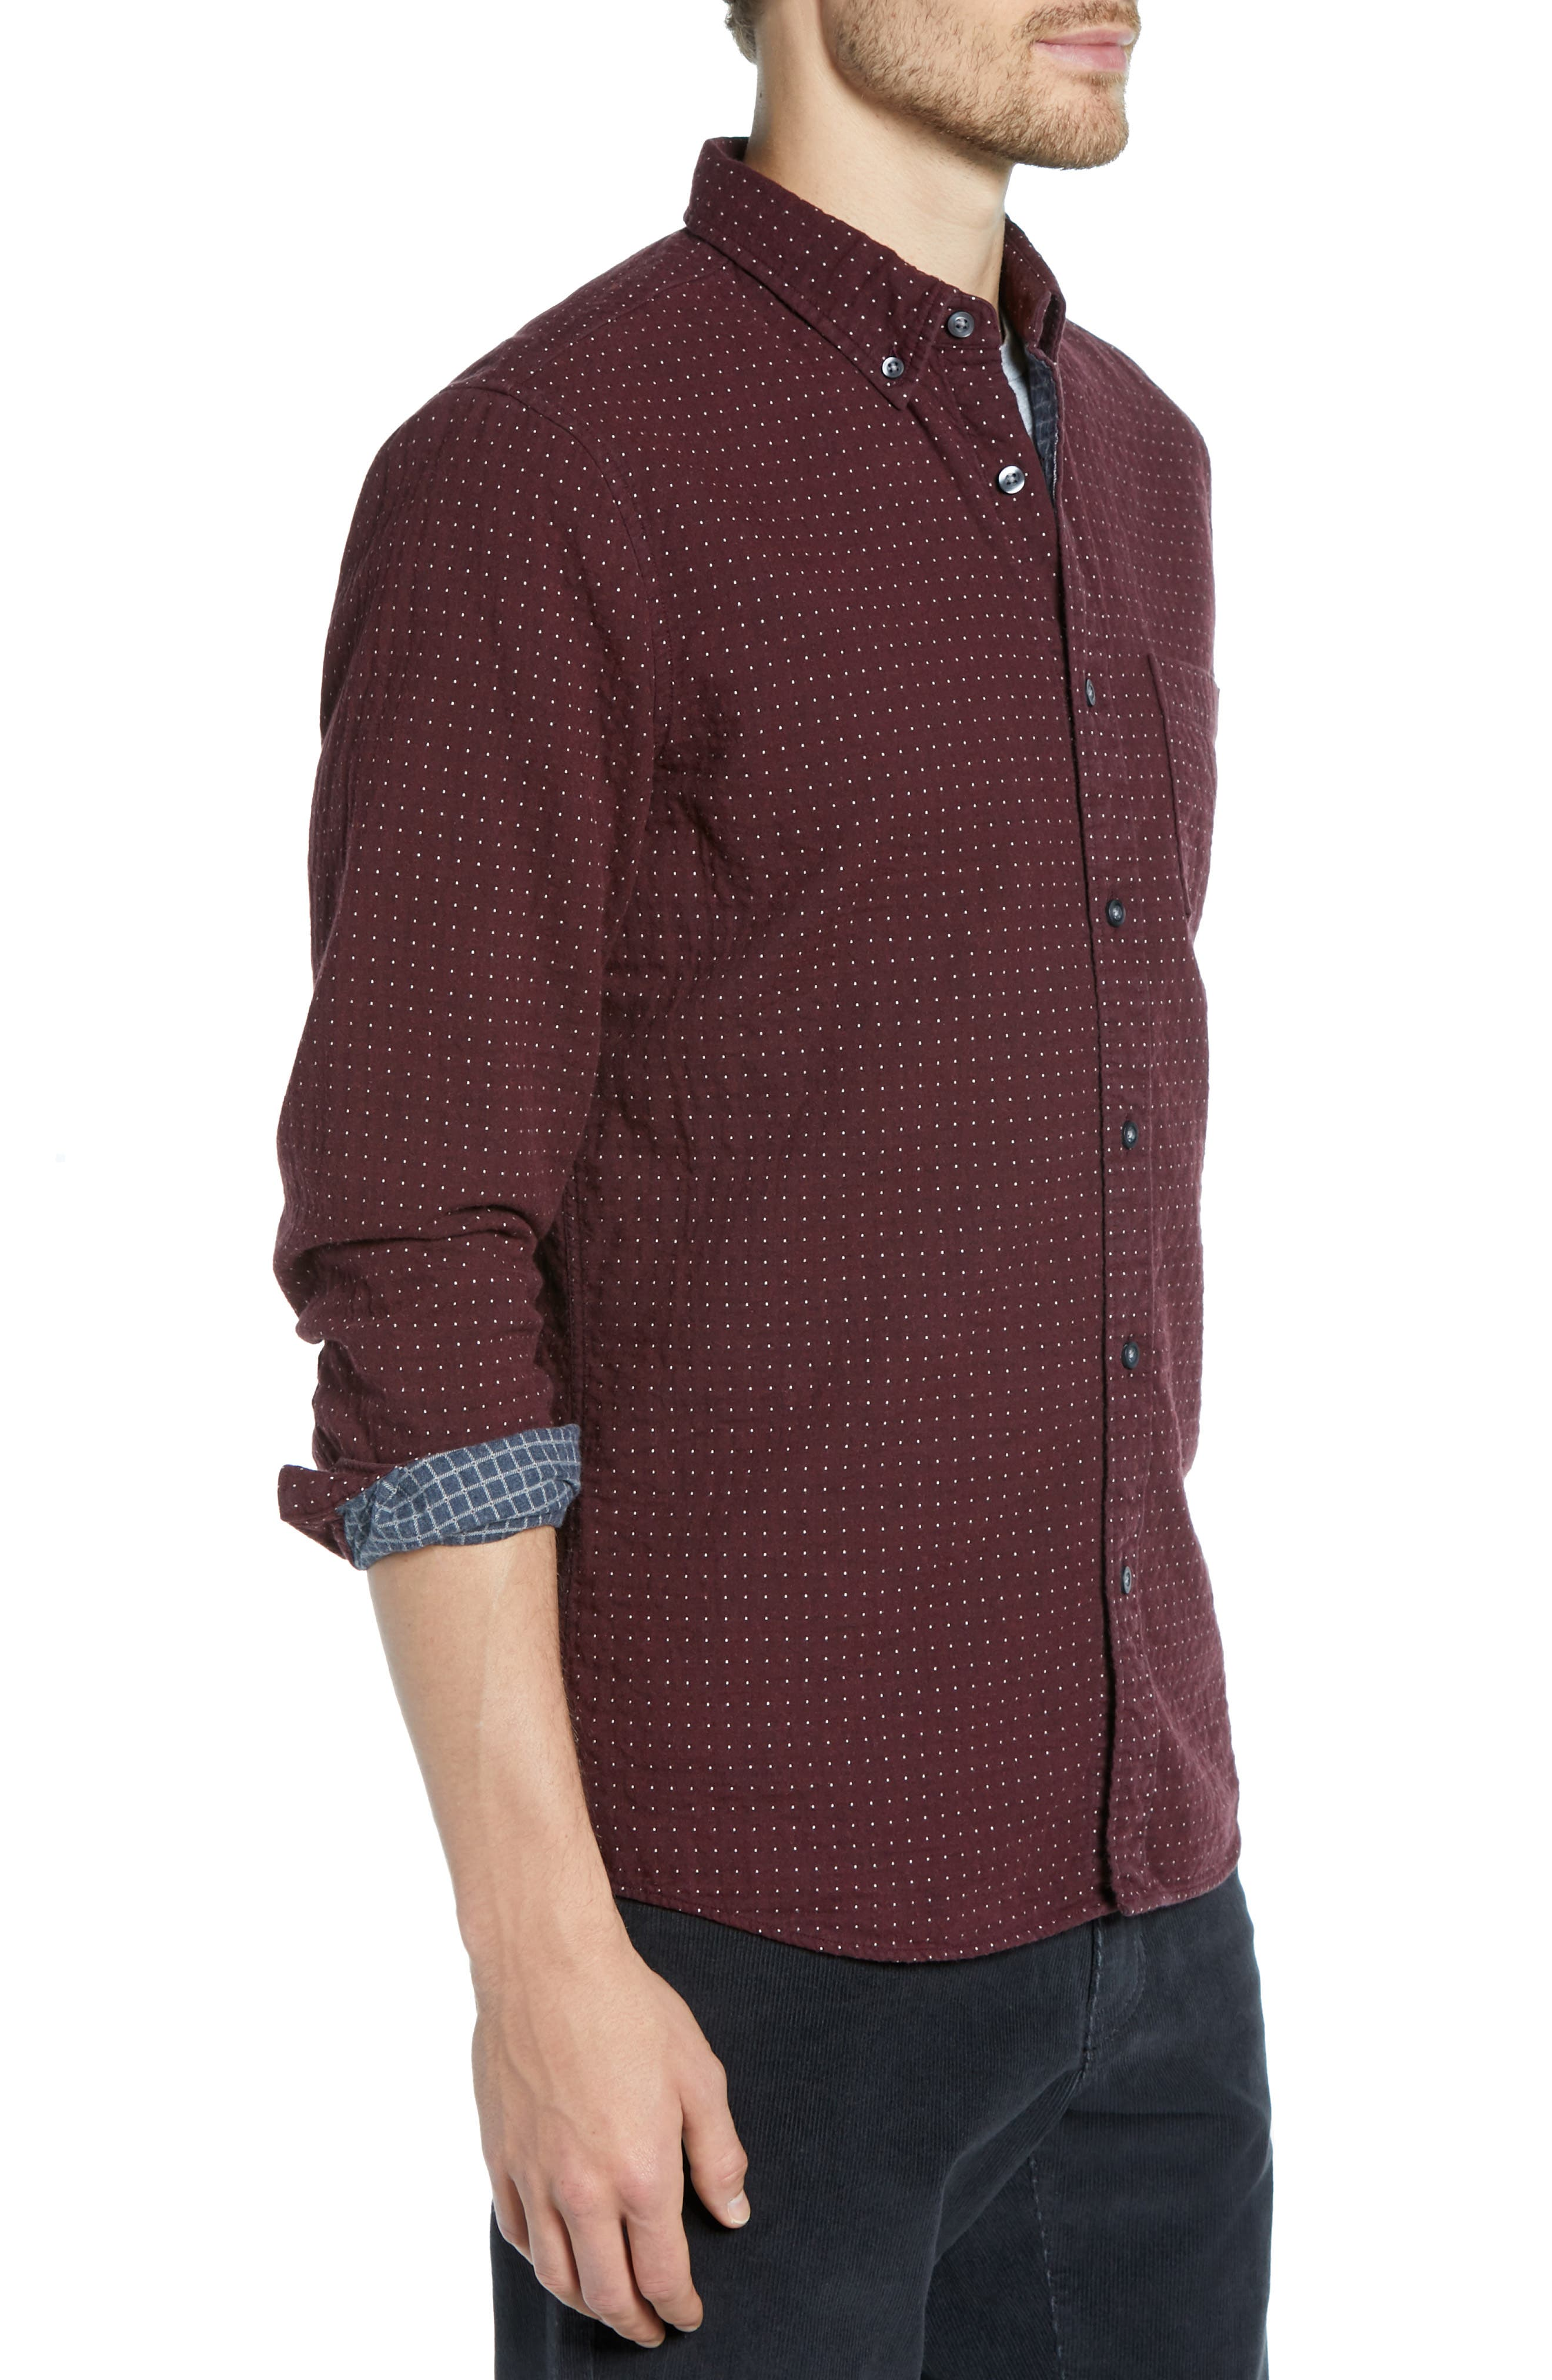 Trim Fit Dot Flannel Sport Shirt,                             Alternate thumbnail 4, color,                             BURGUNDY ROYALE GREY DUOFOLD